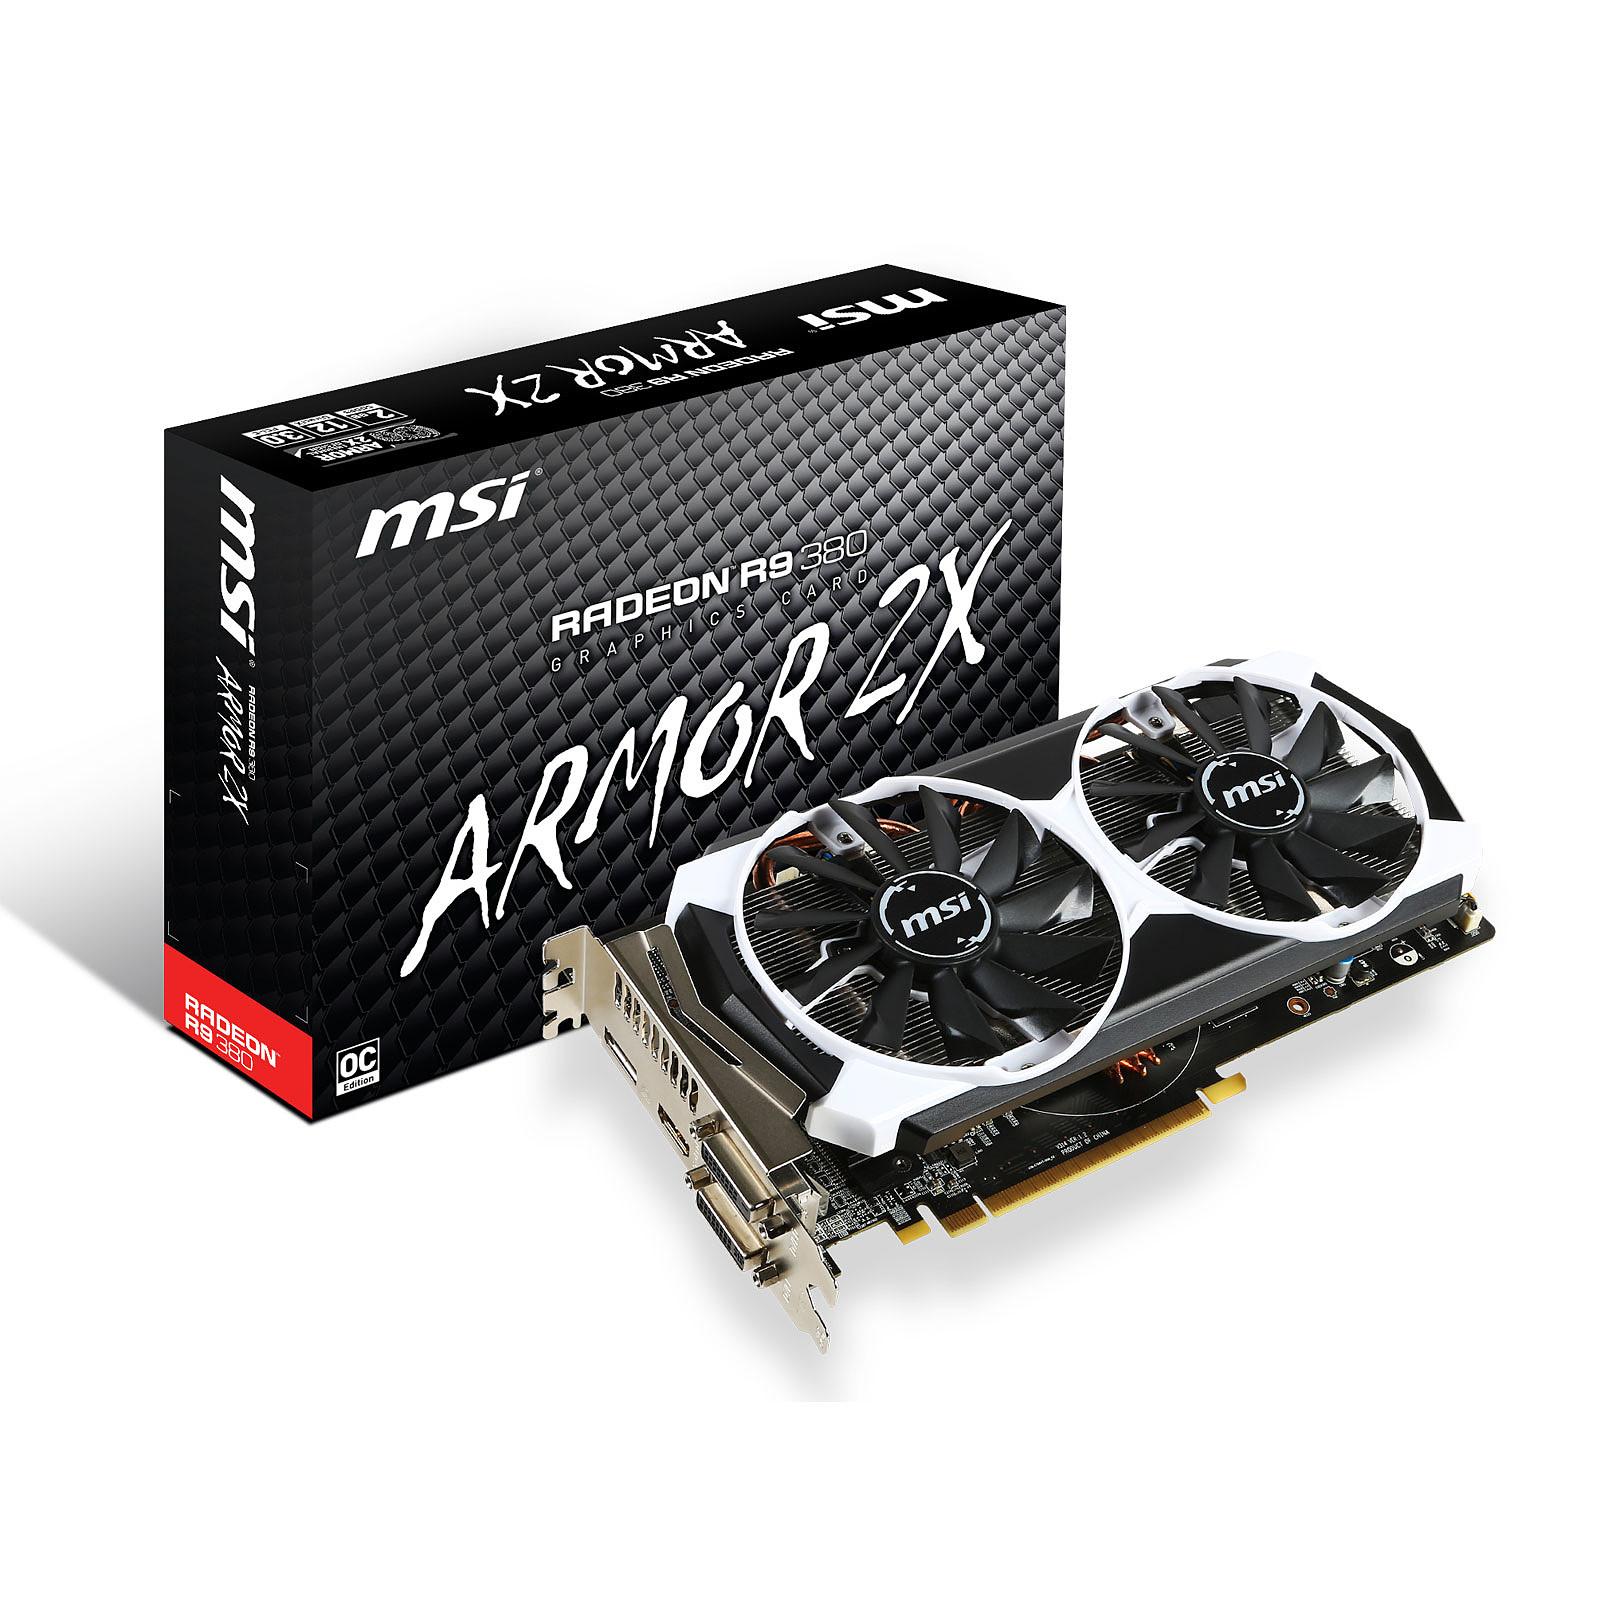 MSI Radeon R9 380 2GD5T OC